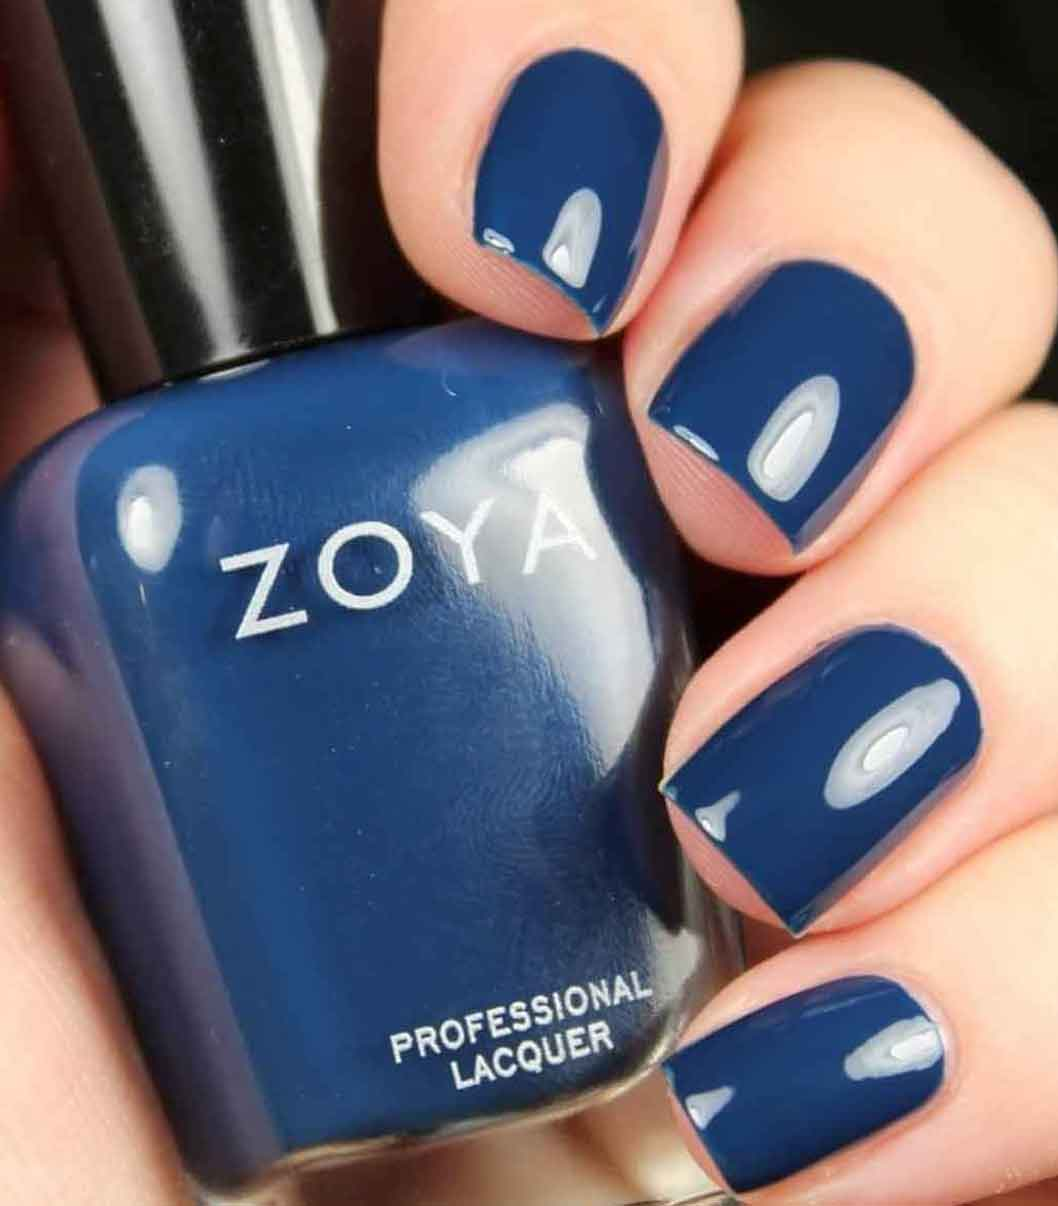 Beauty sustainable ethical nail polish ZOYA US good fashion guide ECOLOOKBOOK